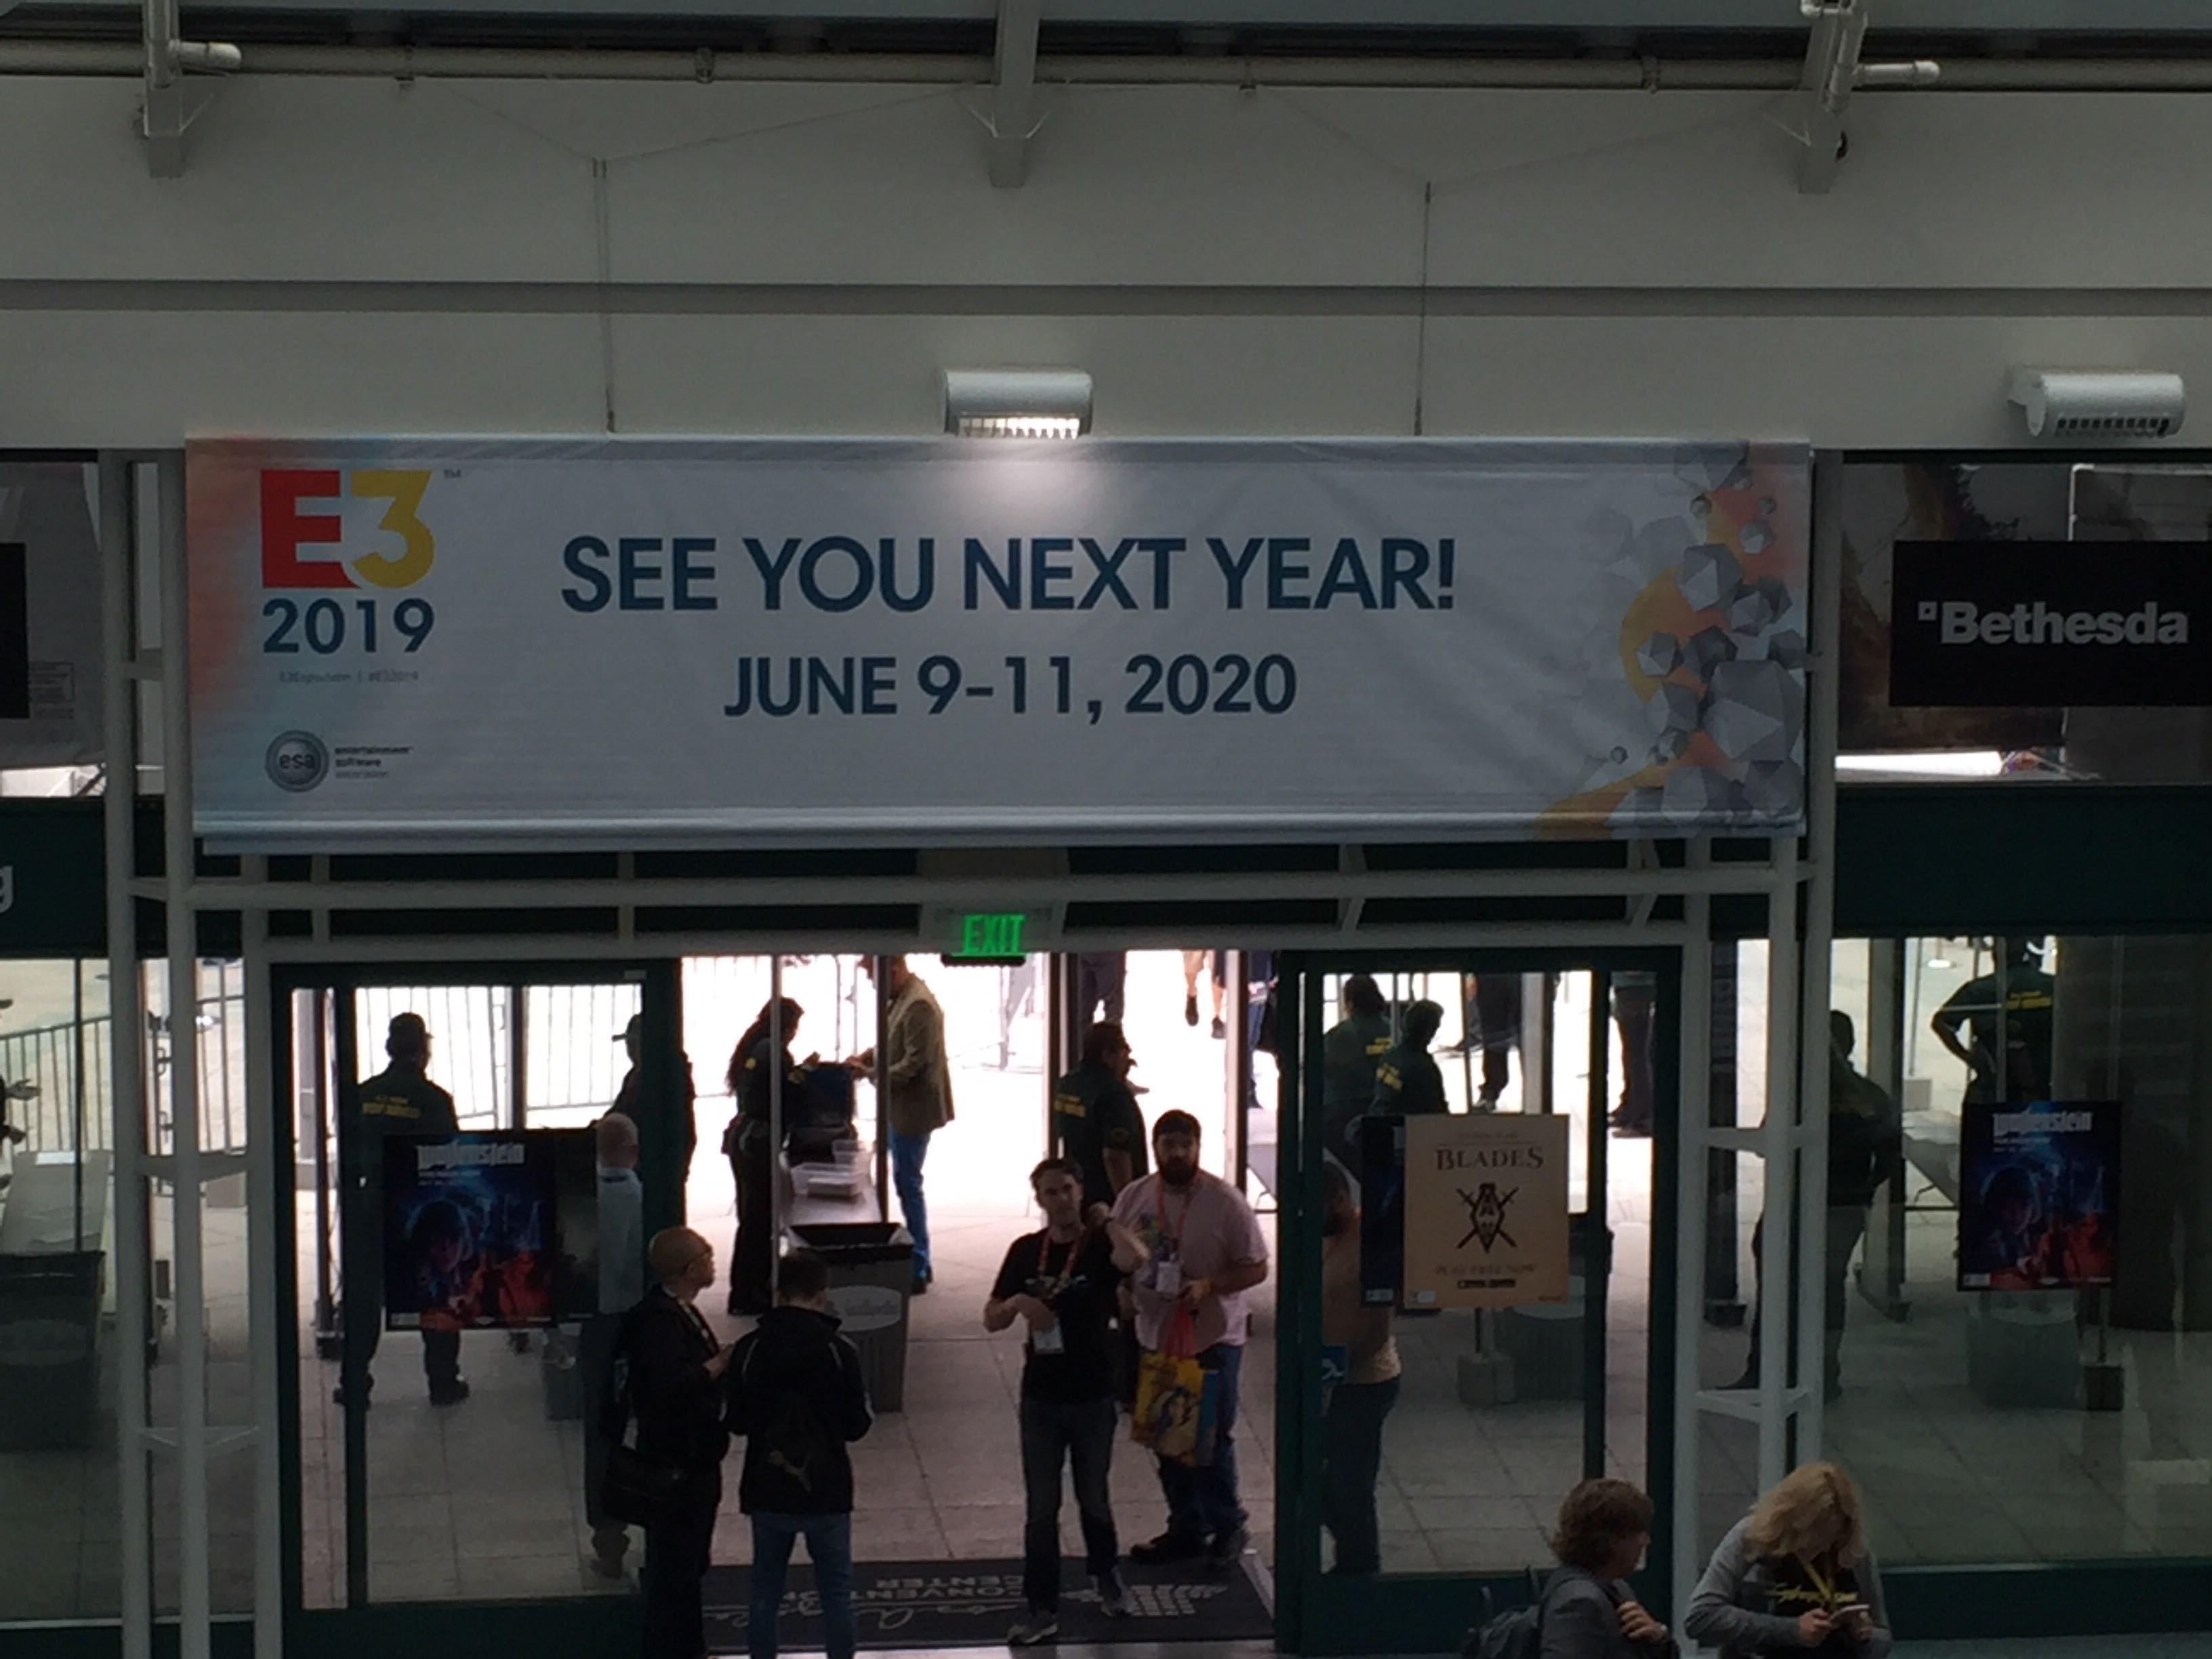 E3 2019 Los Angeles